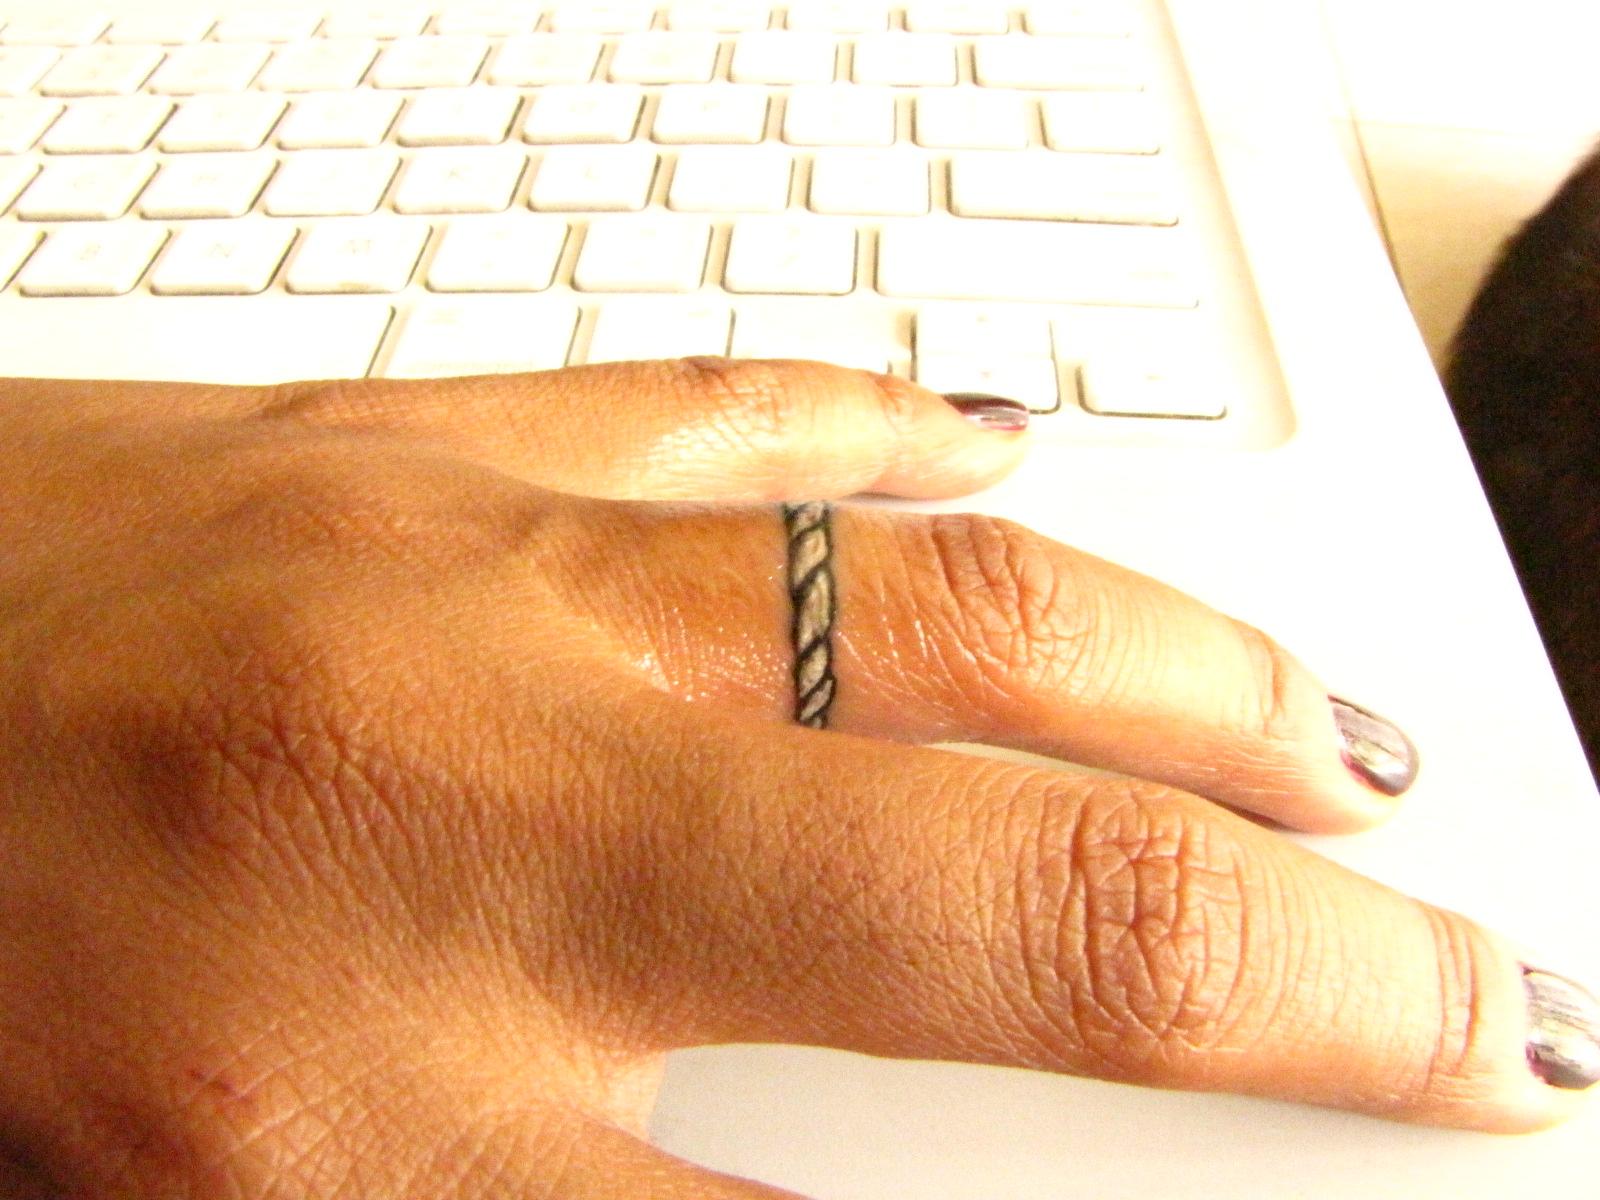 Wedding Ring Tattoos Designs Gallery: The Story Of Leilani & Shawn: Wedding Ring Tattoos, 2